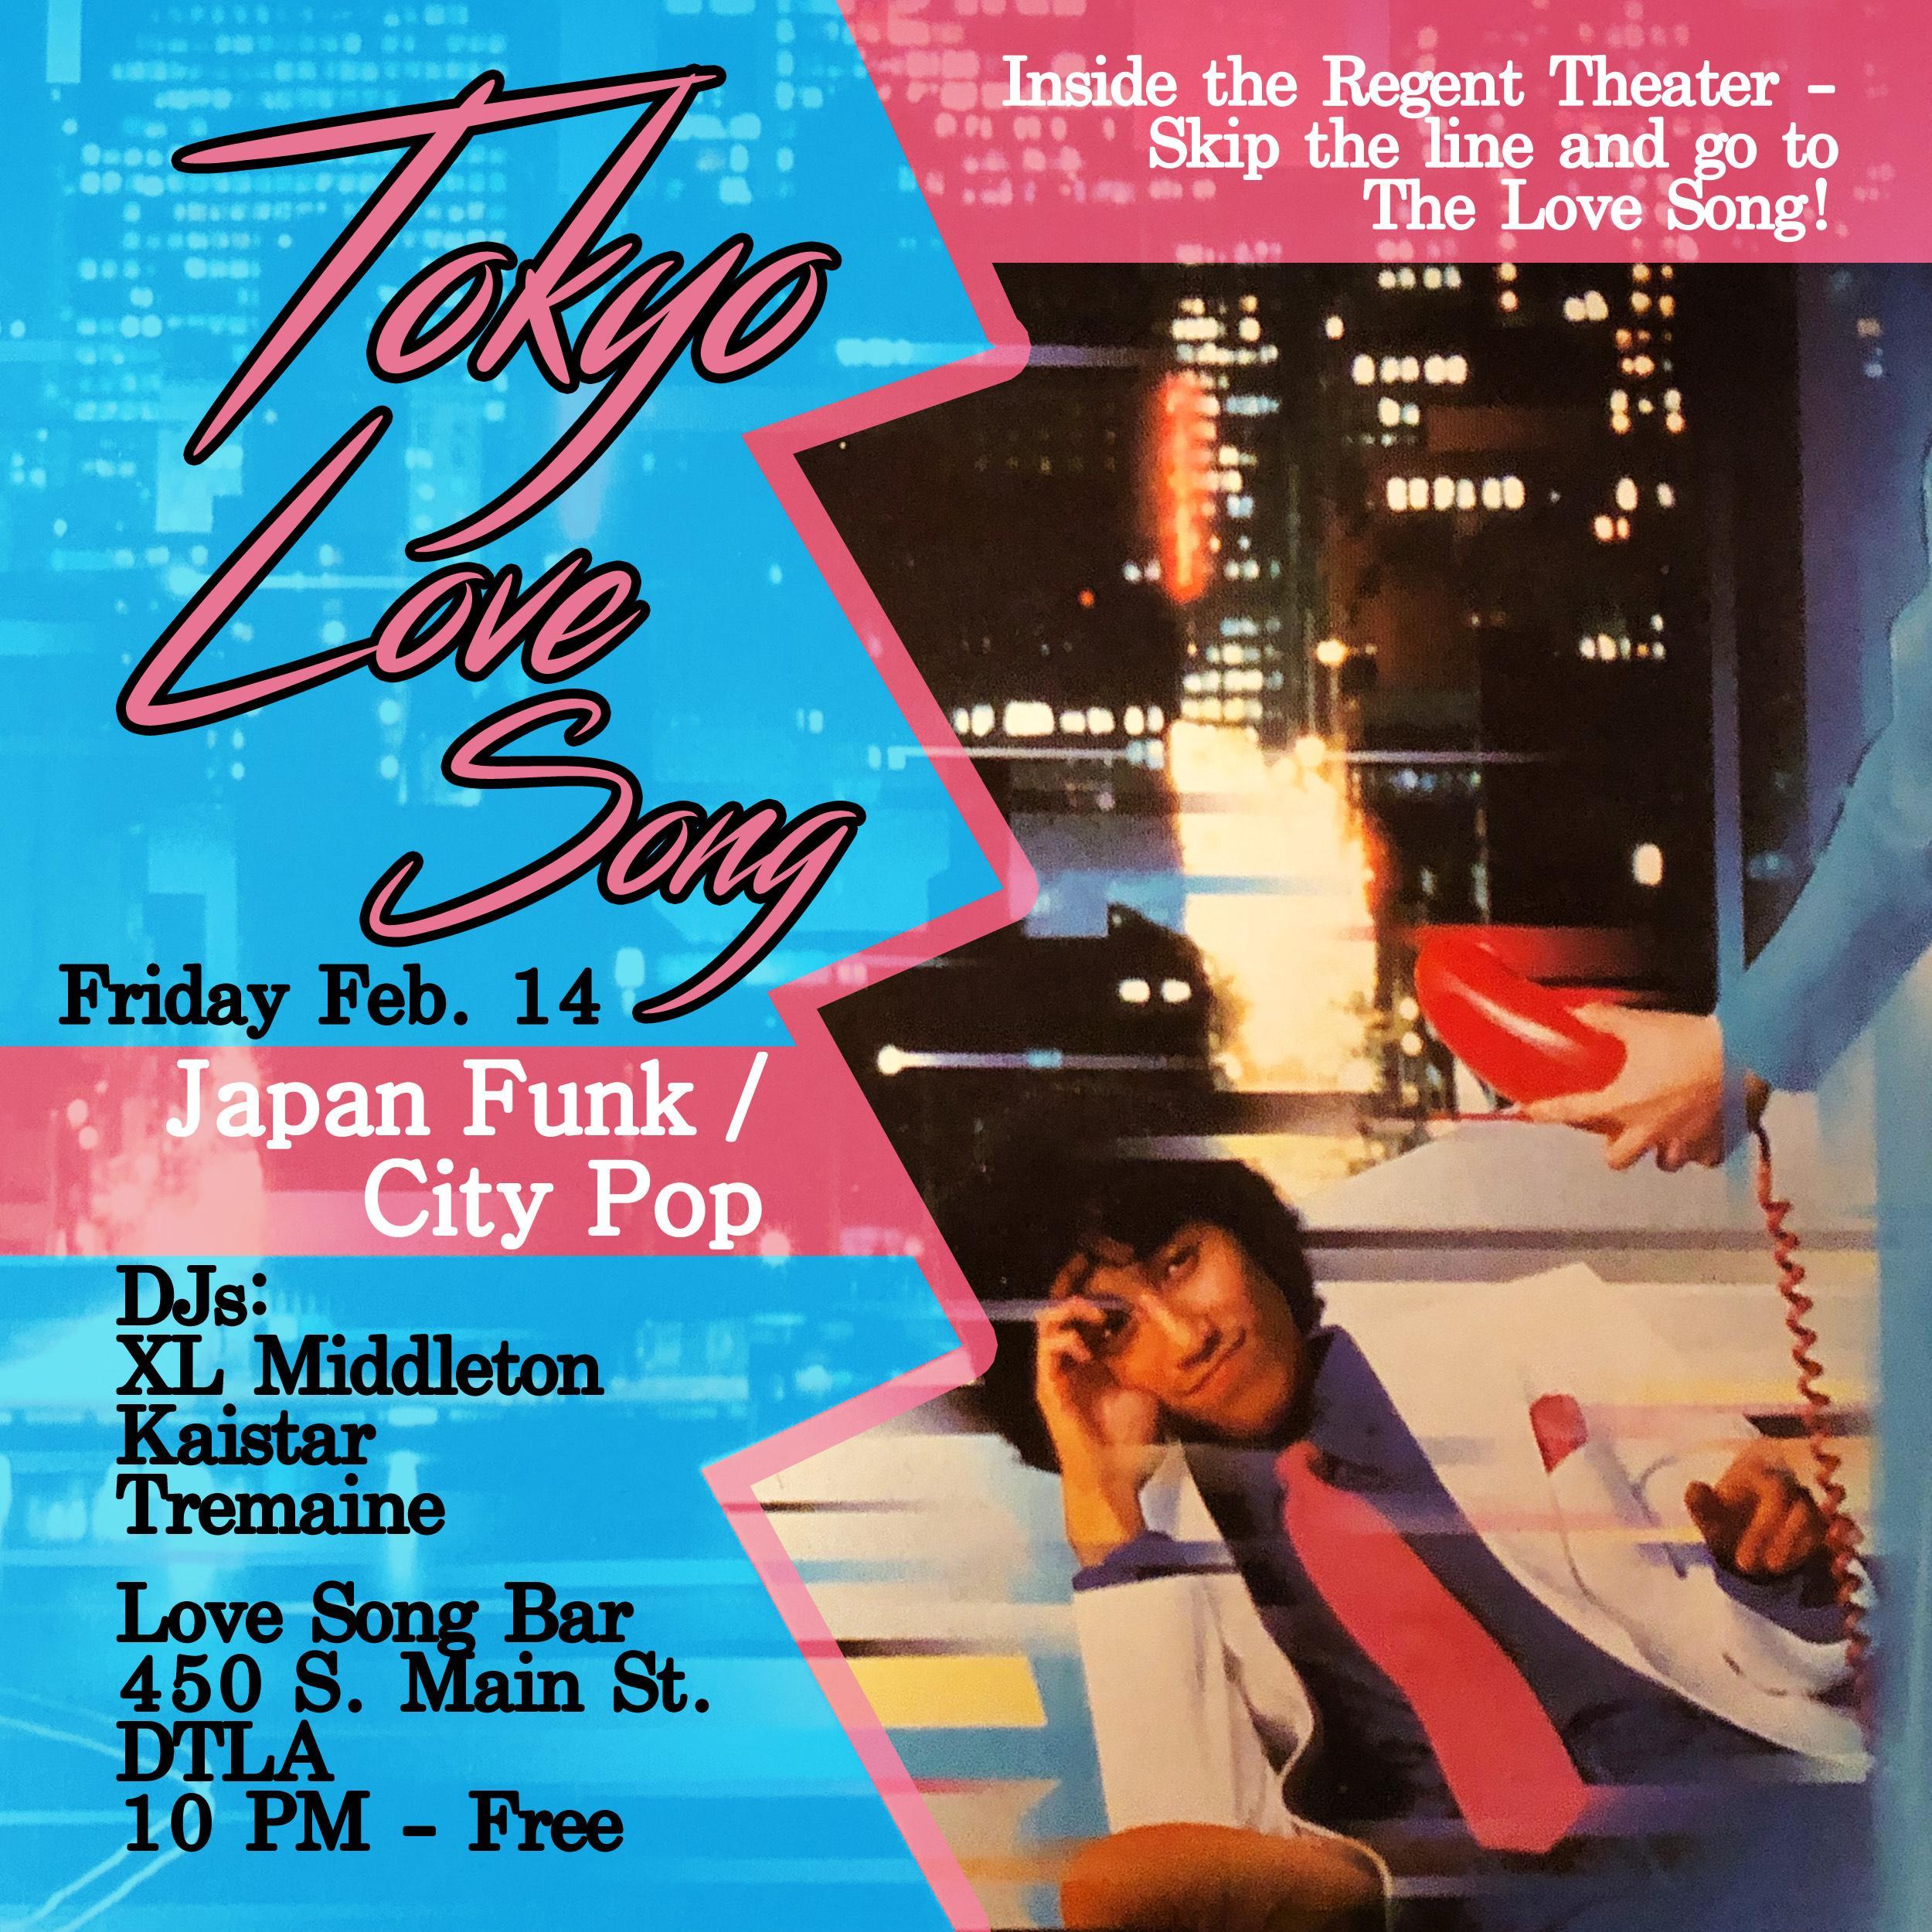 Tokyo Love Song with DJ's XL Middleton, Kaistar, & Tremaine